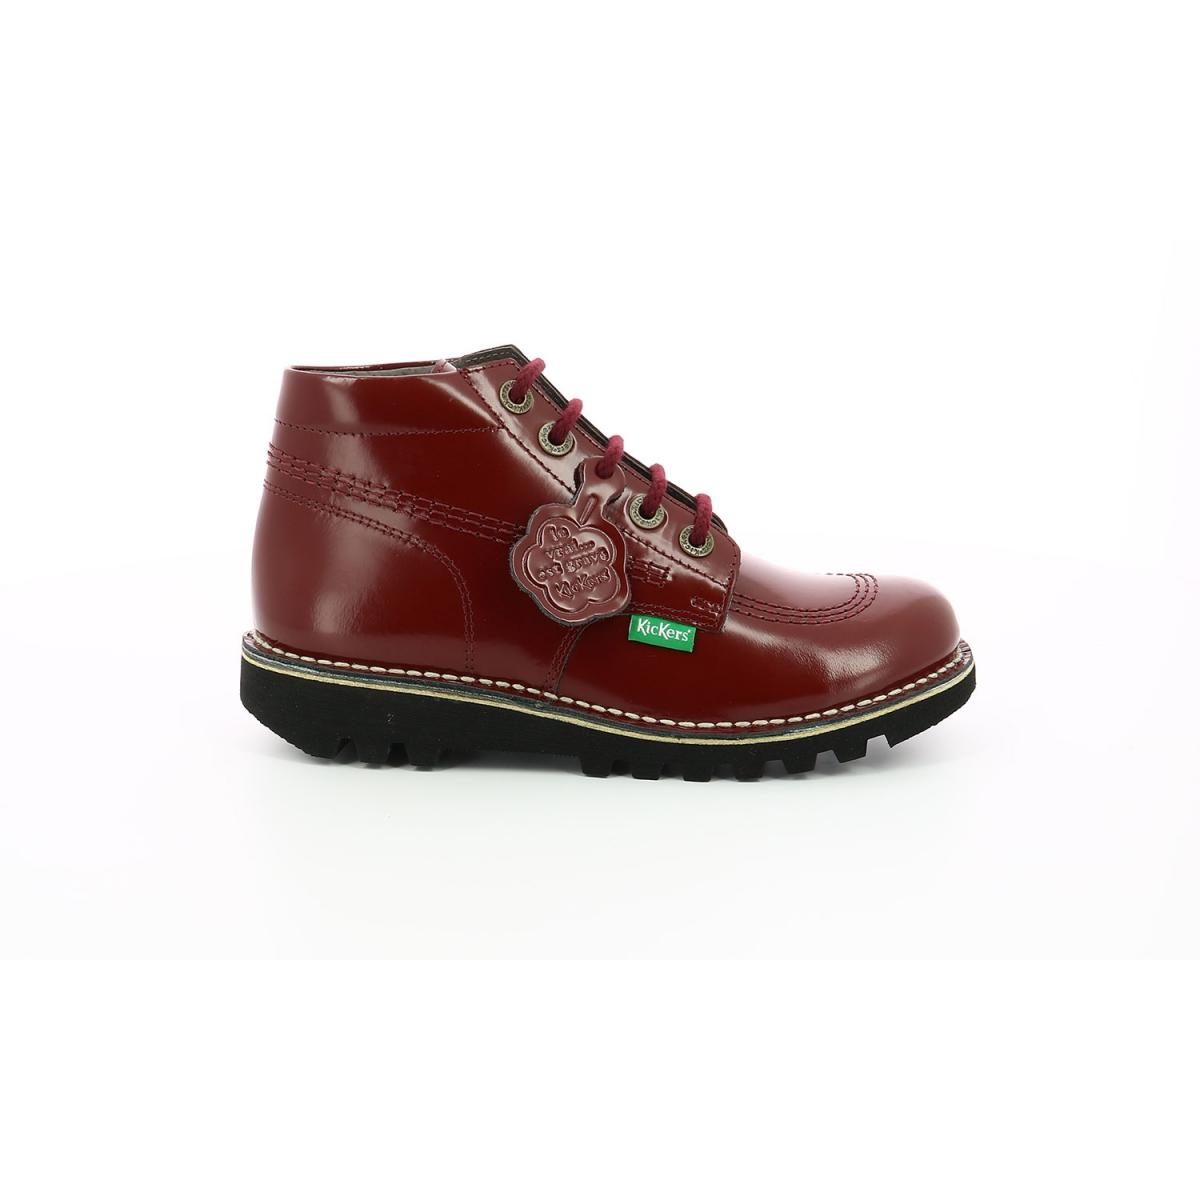 Boots Femme Neorallye rouge foncé Chaussures Femme Kickers